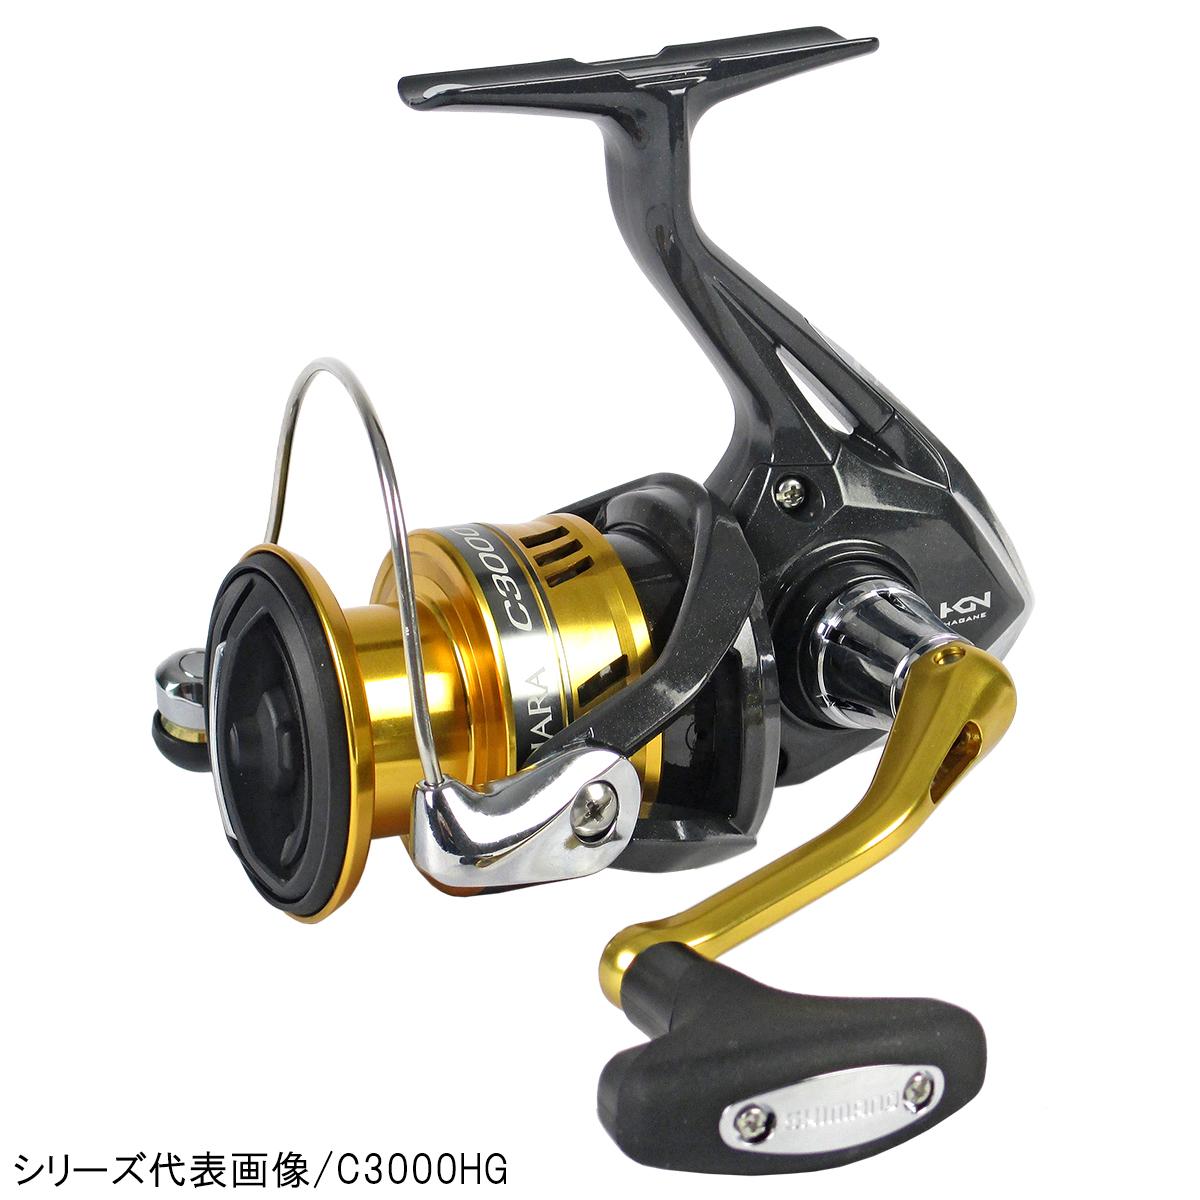 <title>全商品オープニング価格 シマノ サハラ C5000XG</title>